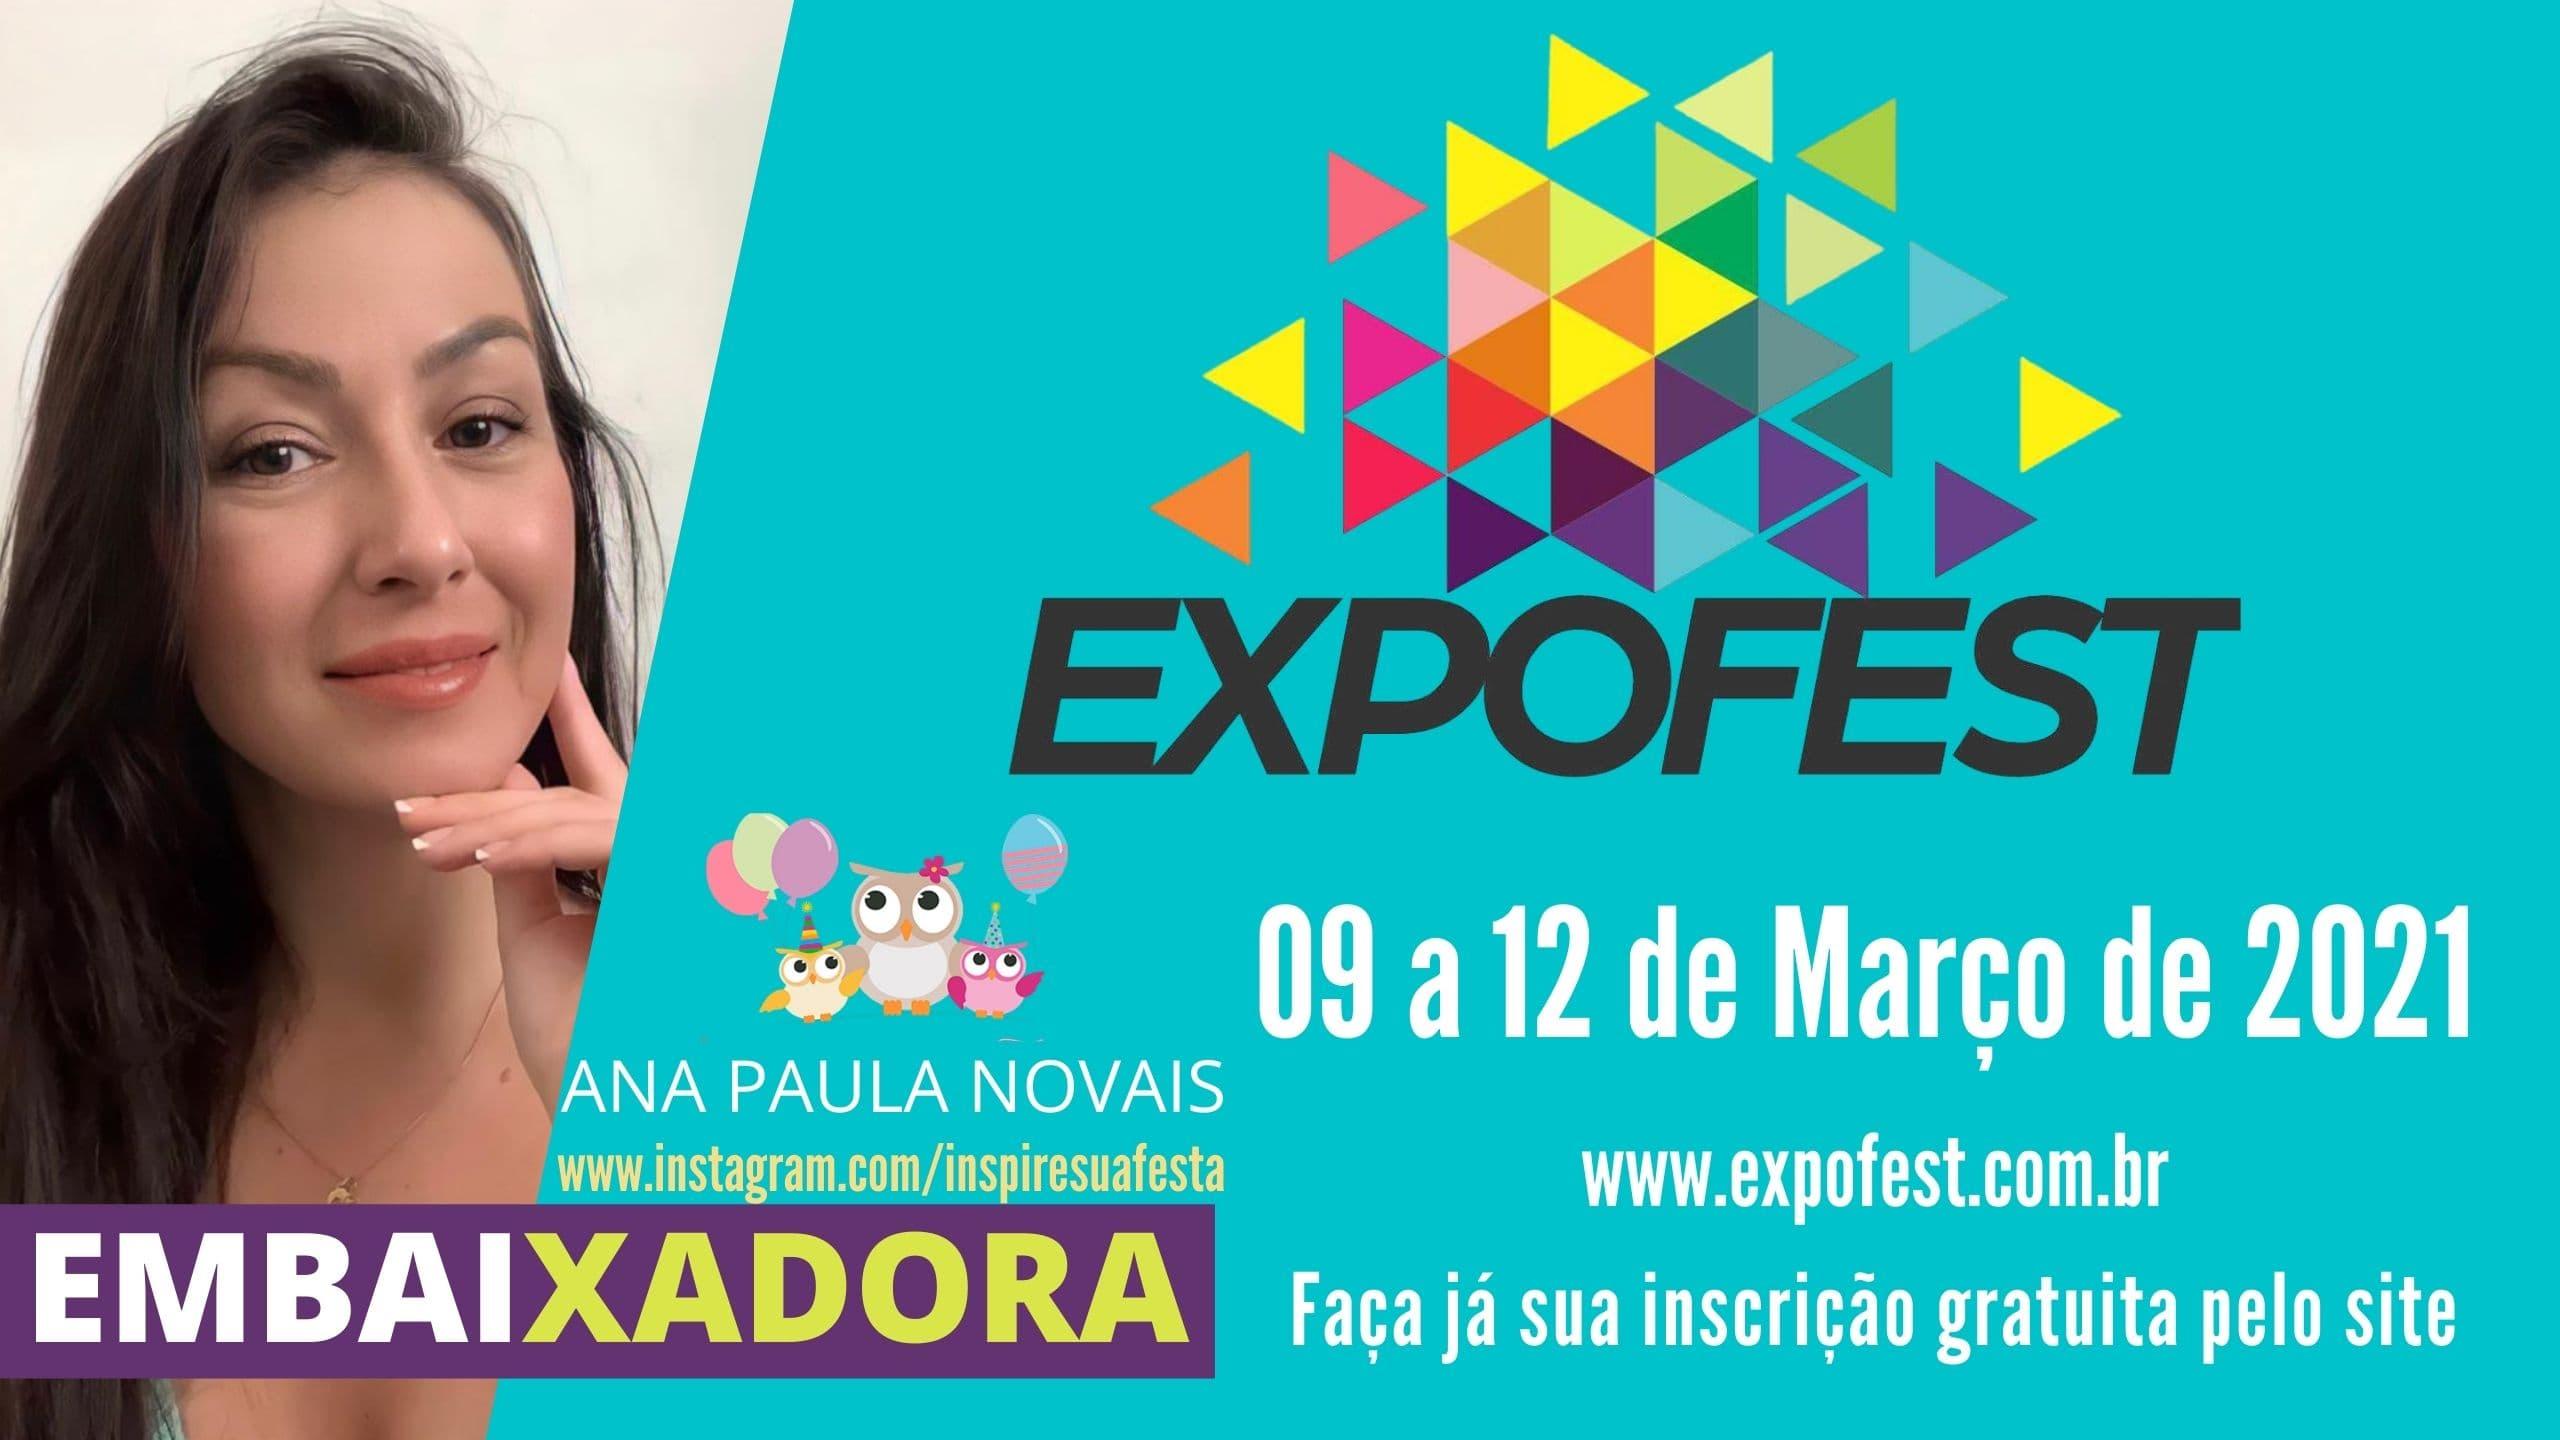 EXPOFEST – A primeira feira on-line de festas da América latina